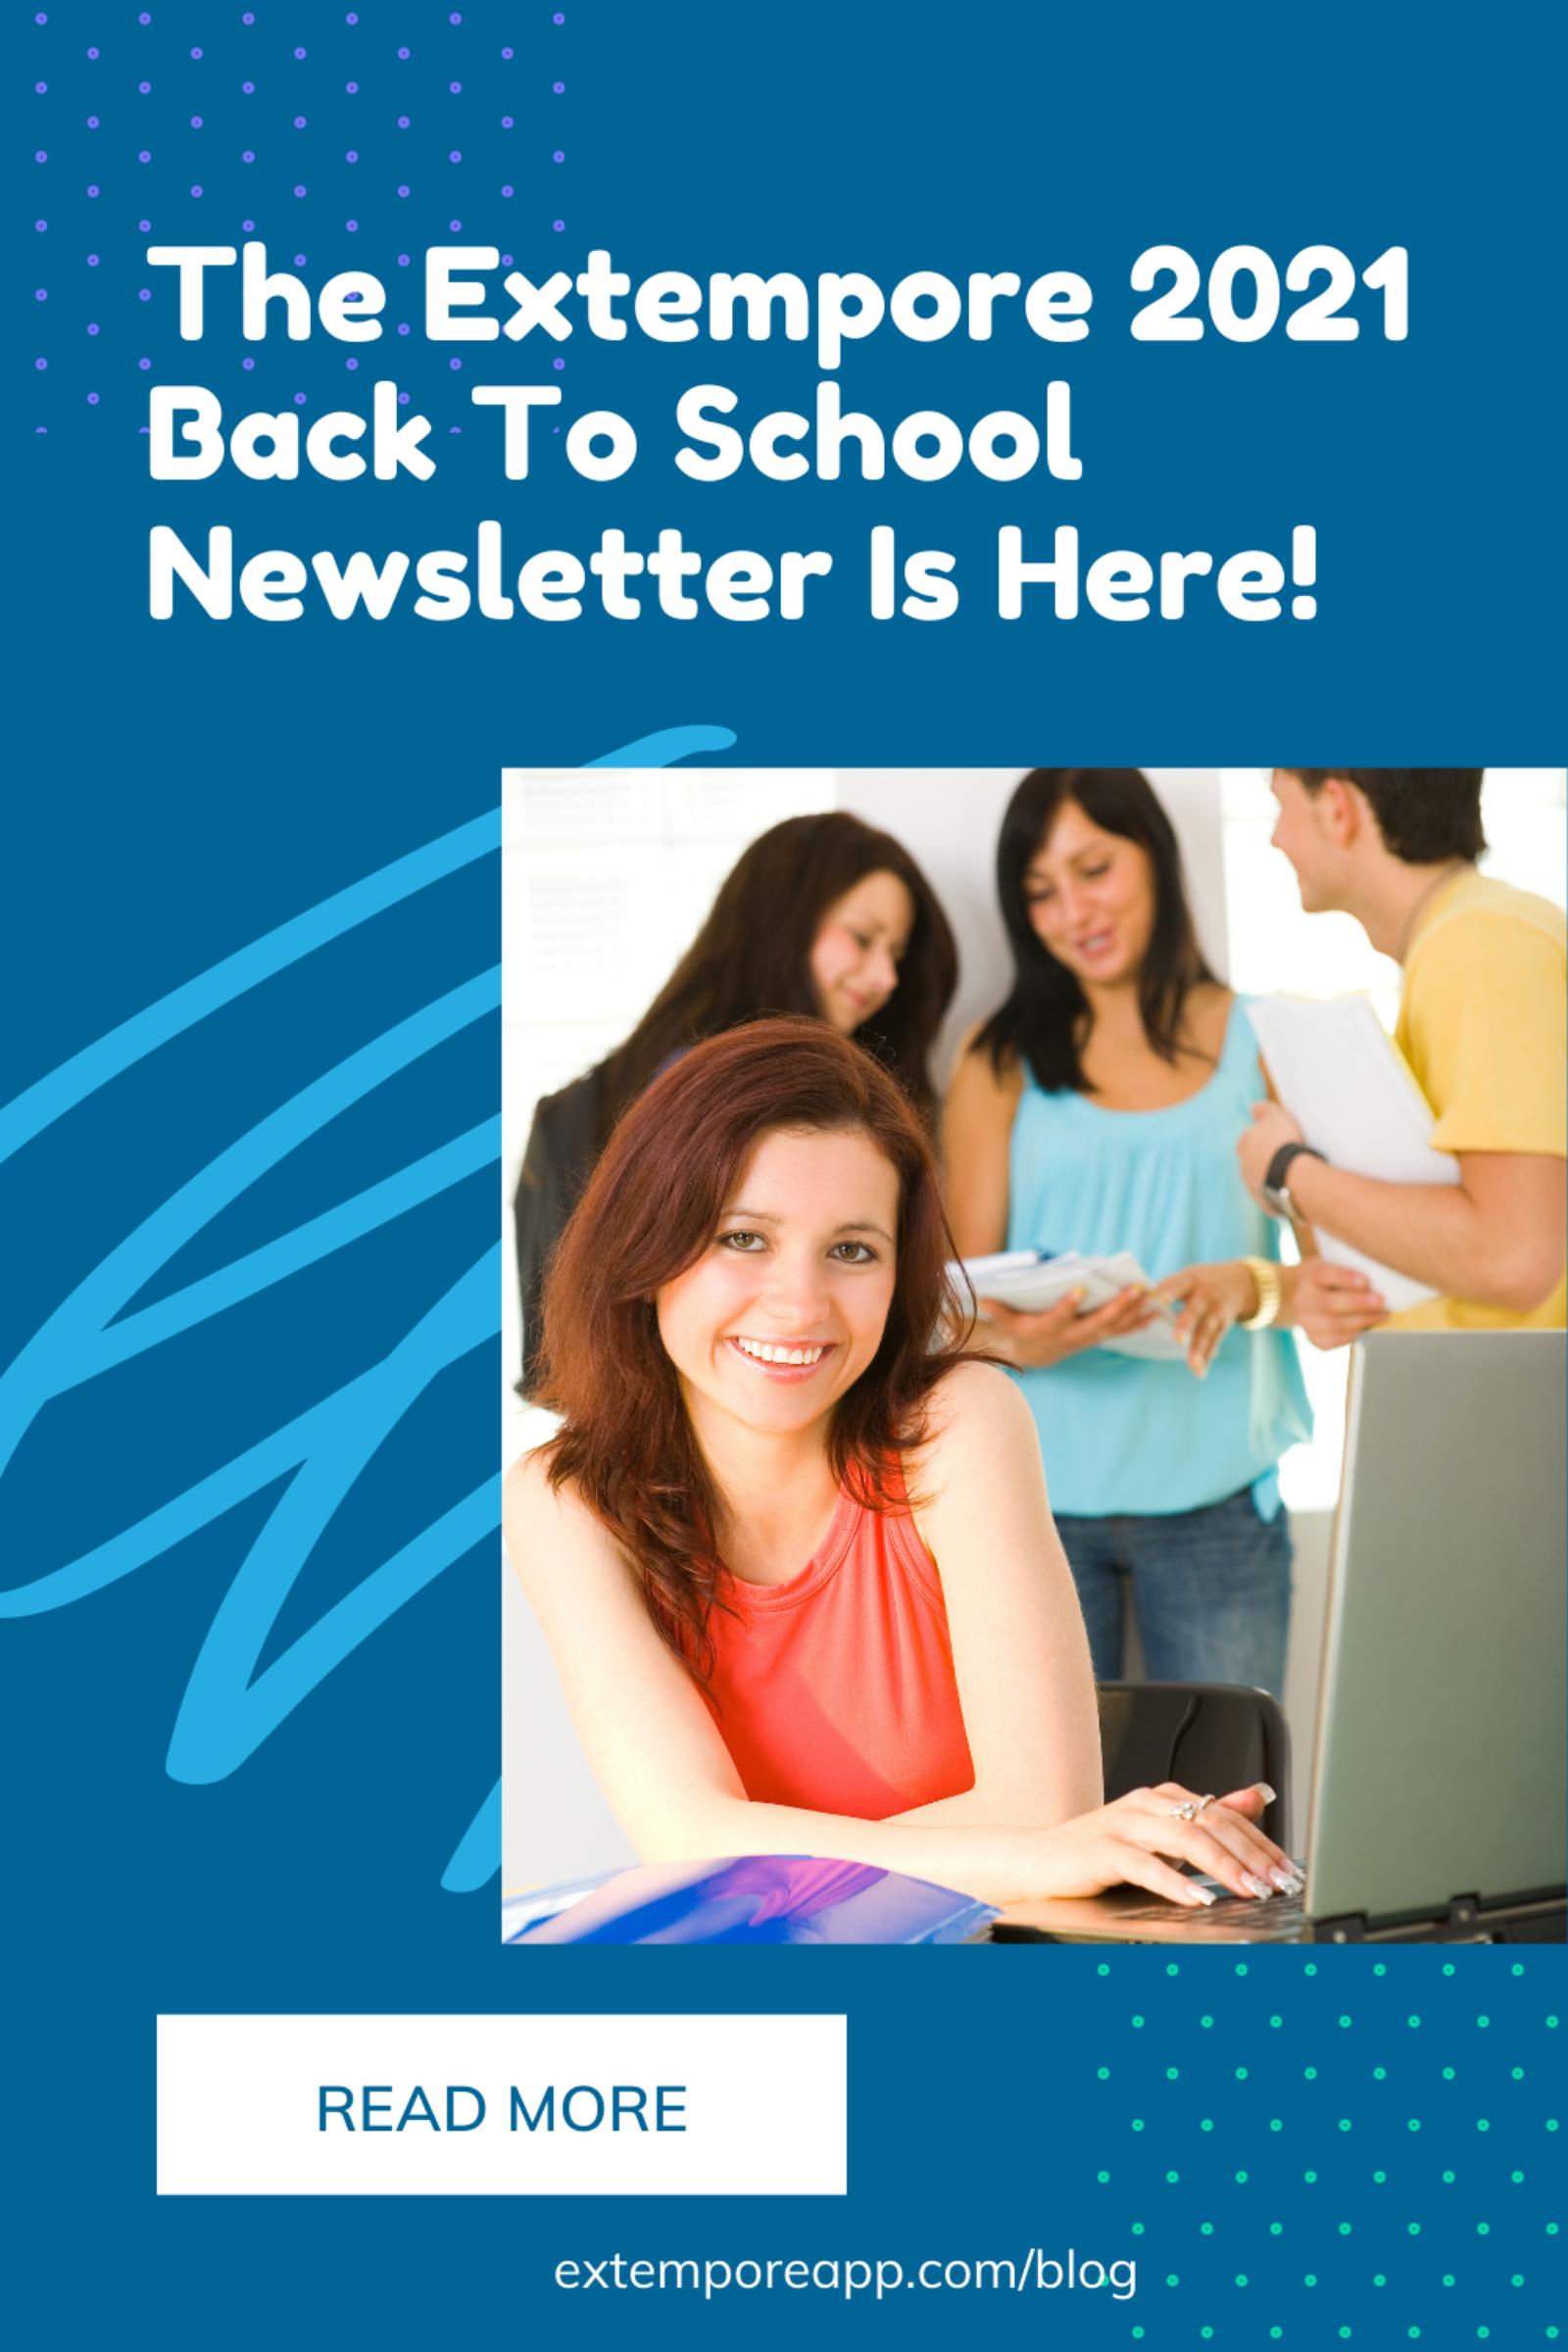 2021 Back To School Newsletter